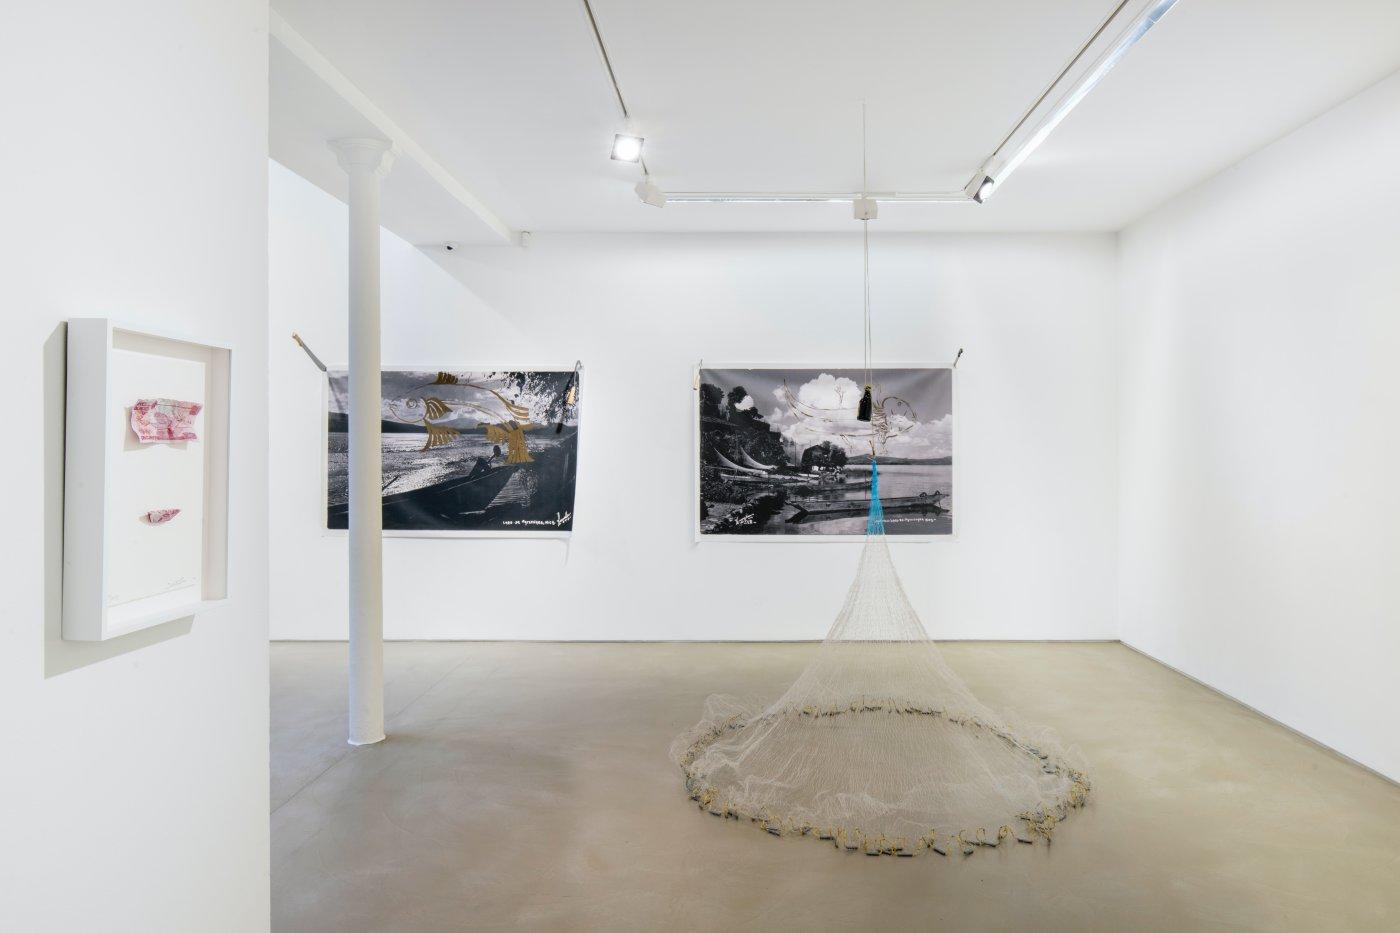 Galerie Chantal Crousel Rhe 3